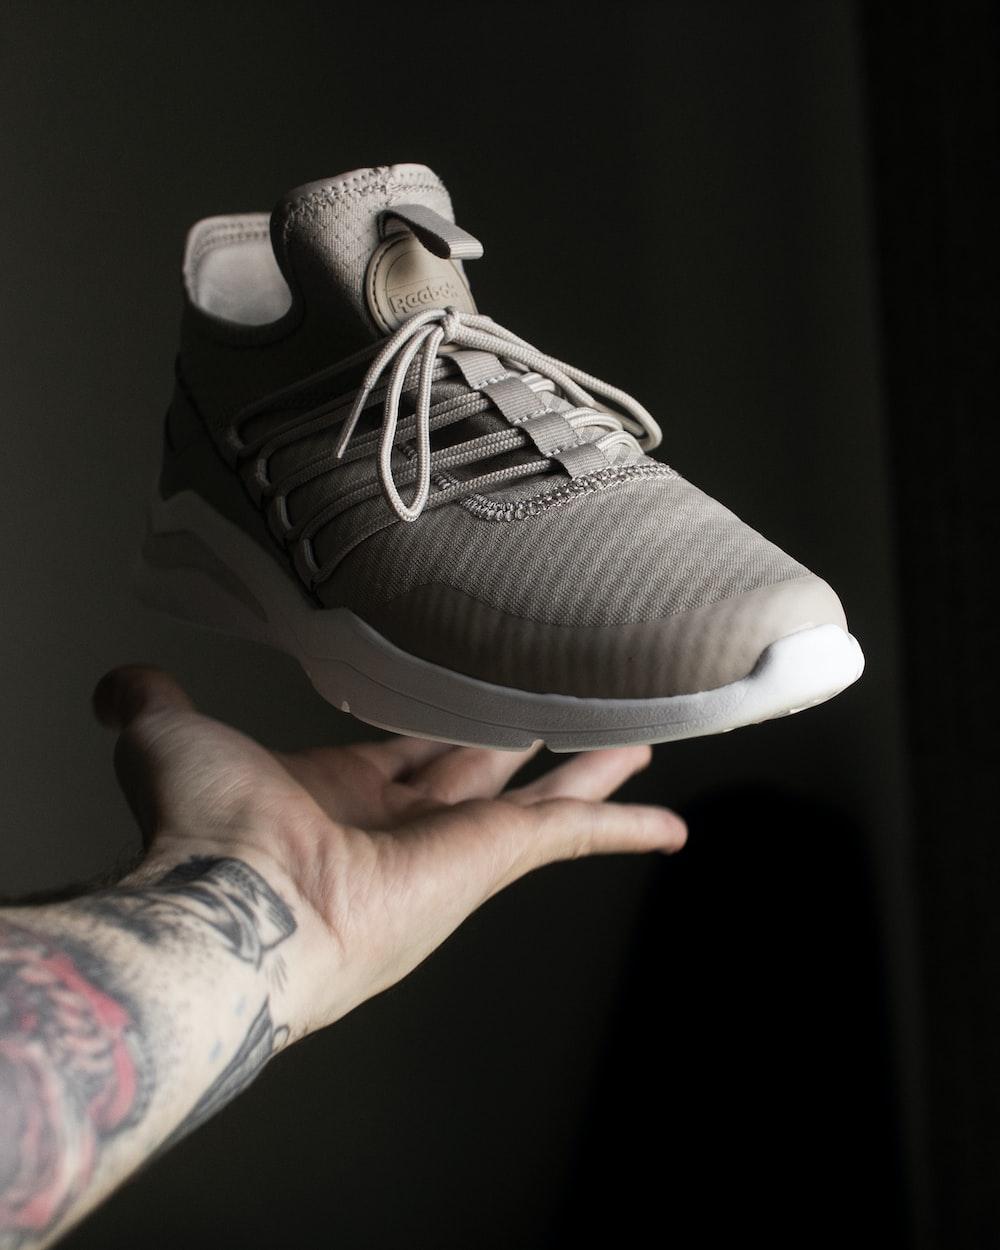 unpaired brown running shoe